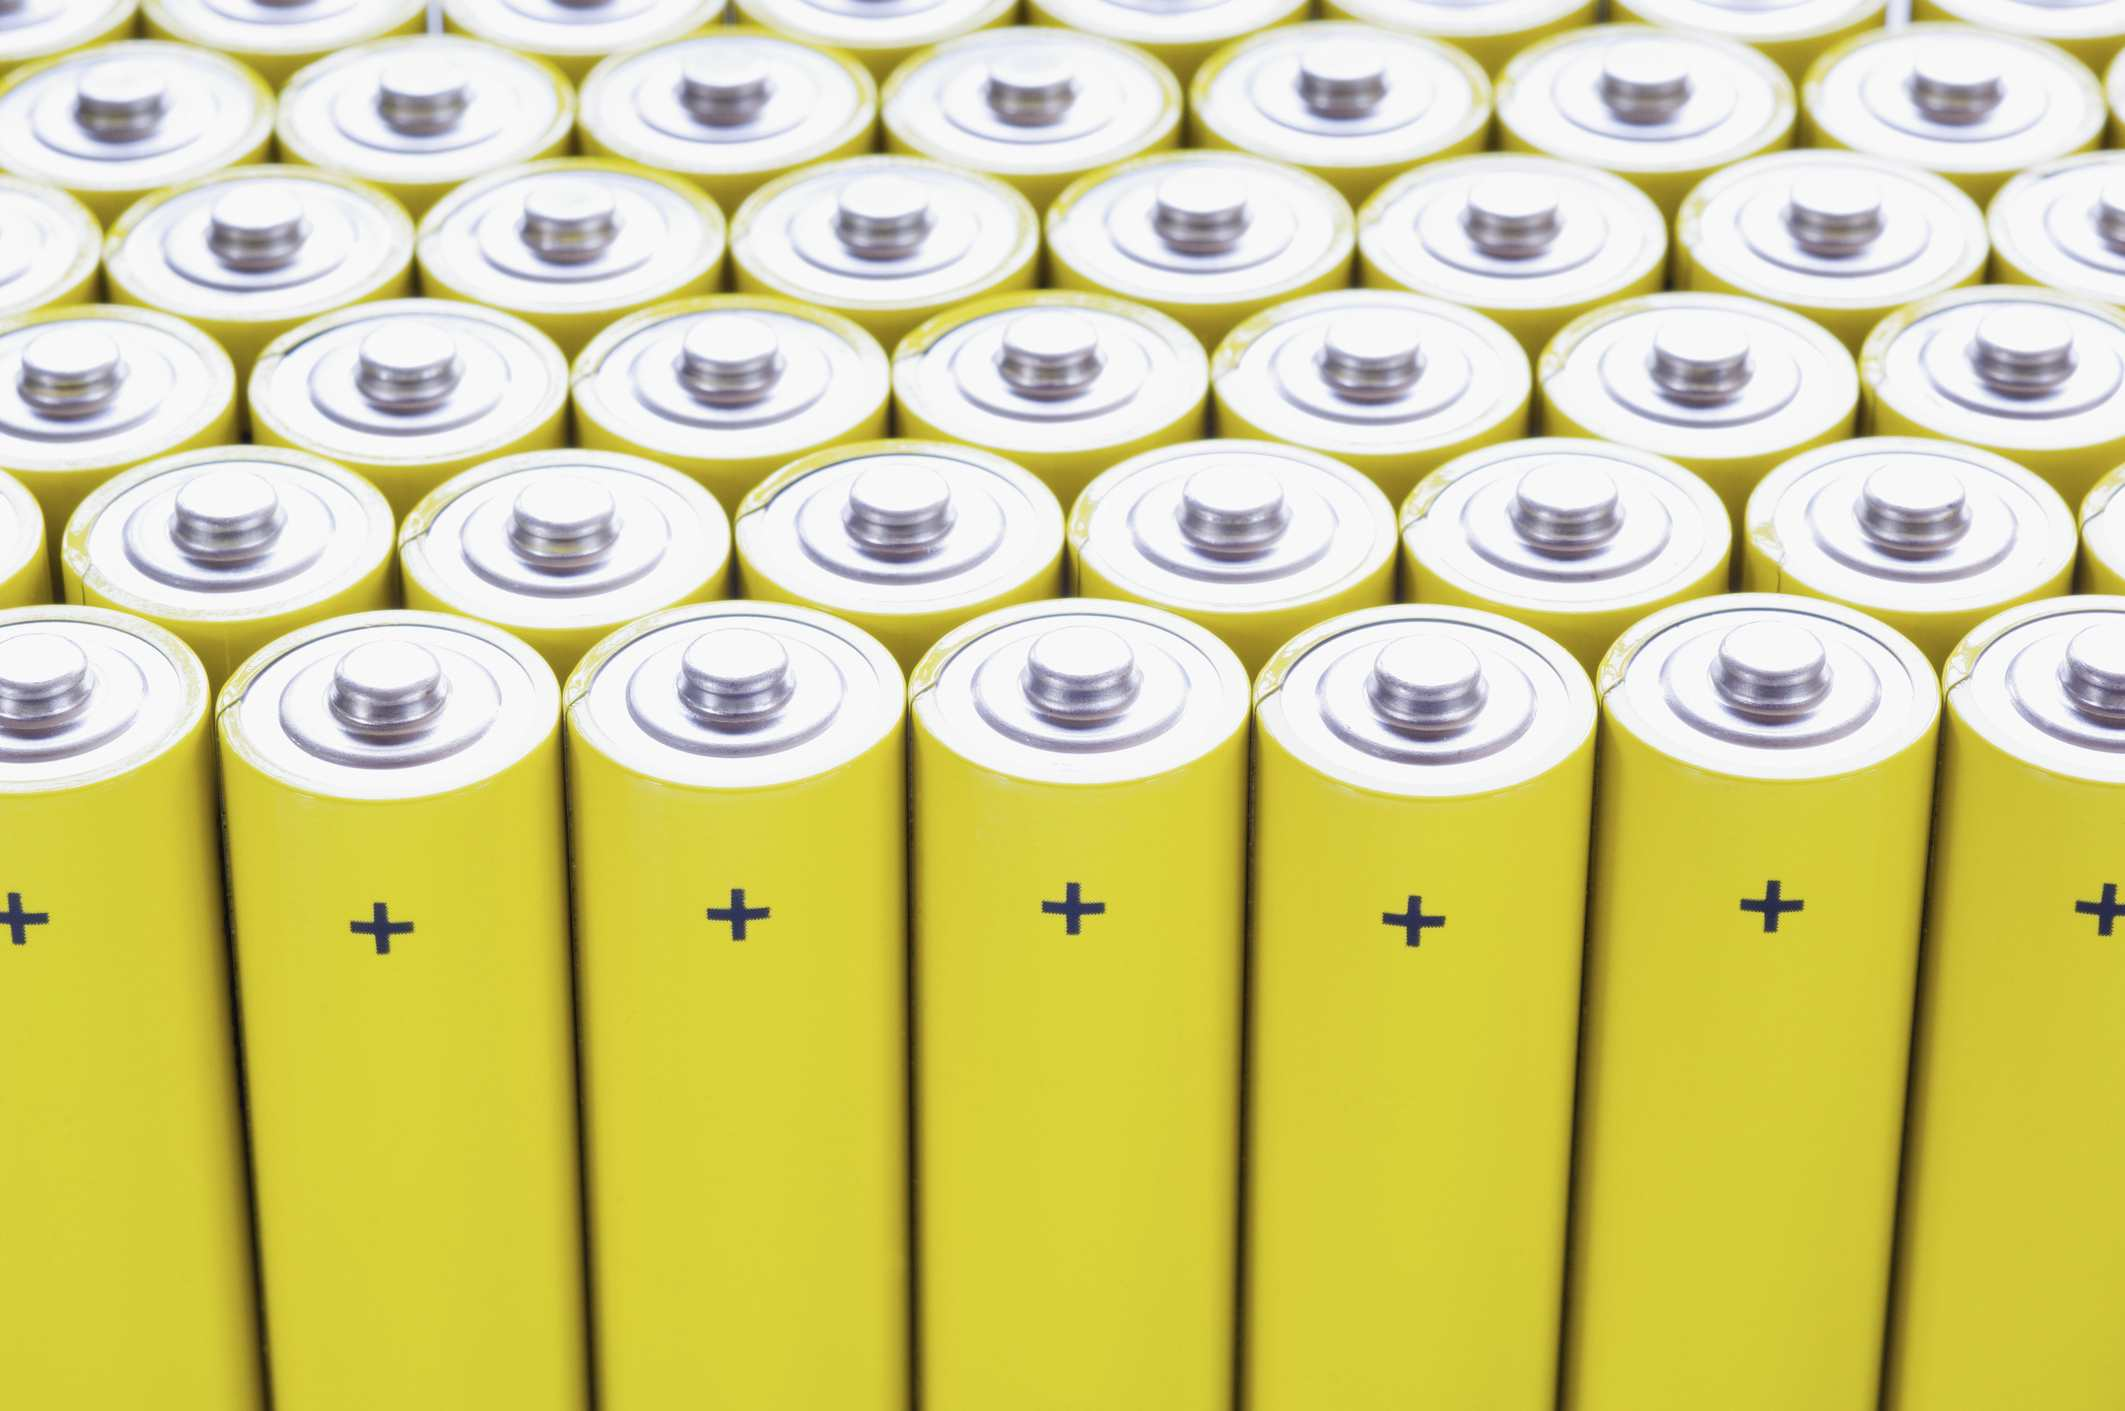 A vast array of batteries